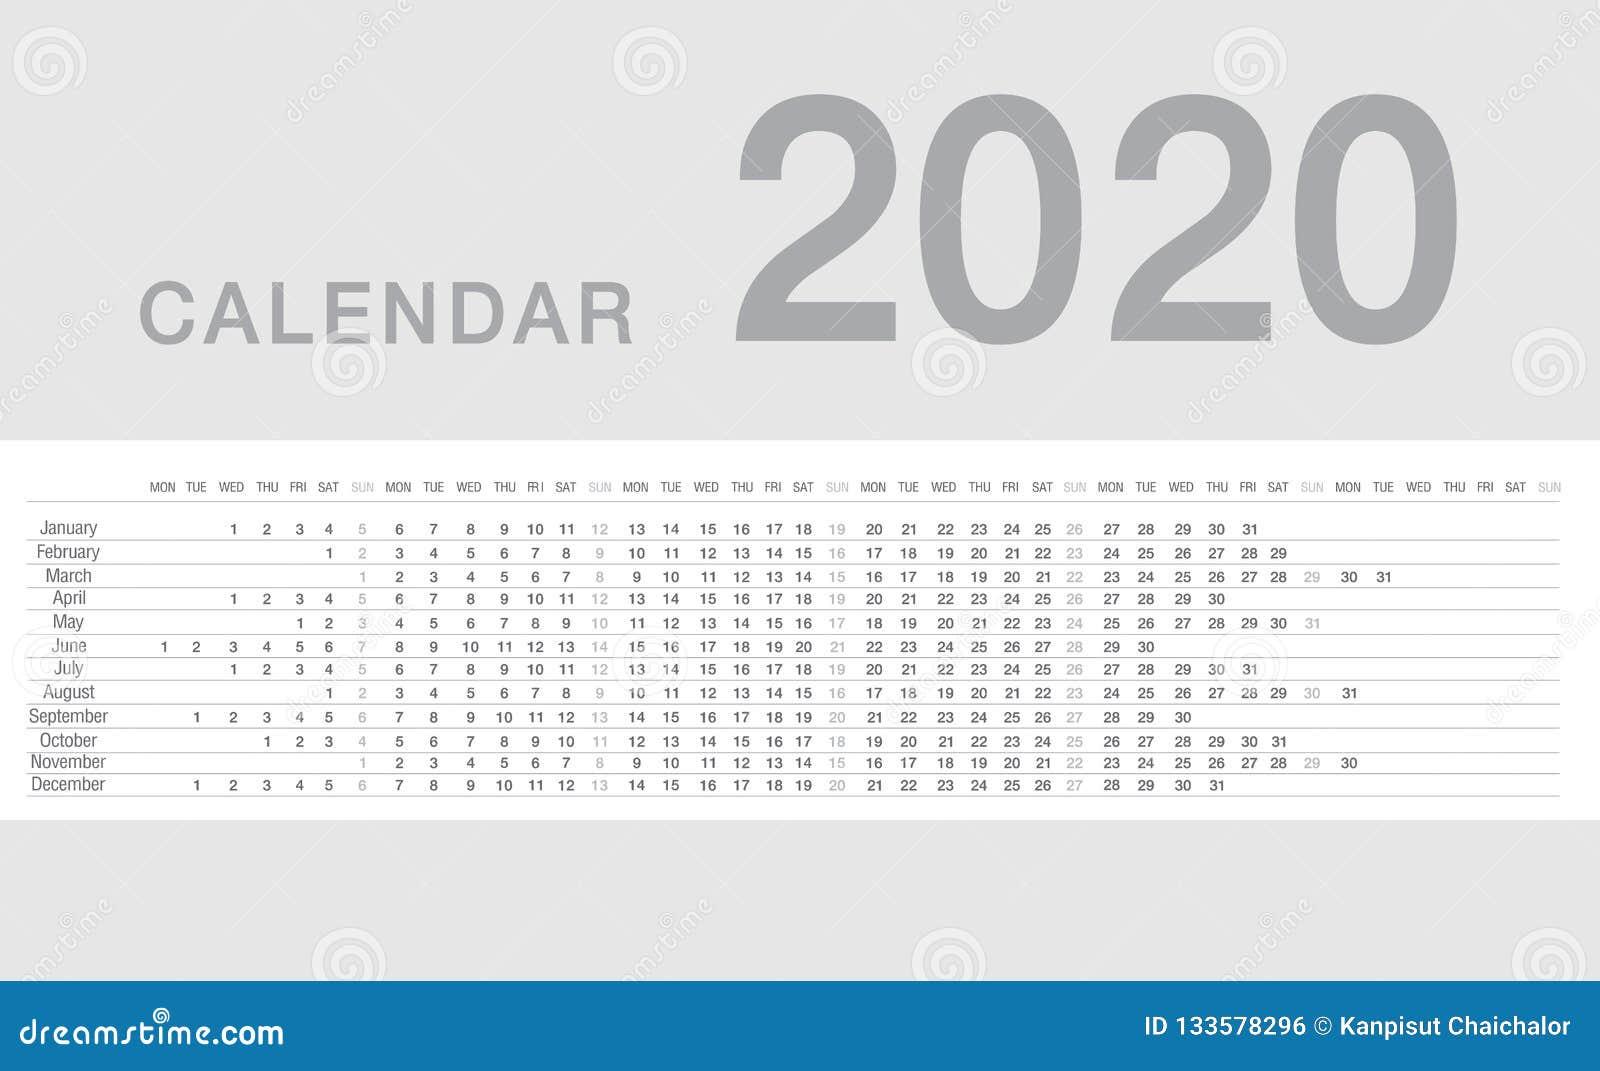 Calendar Year 2020 Calendar Year 2020 Vector Design Template, Simple And Clean Design